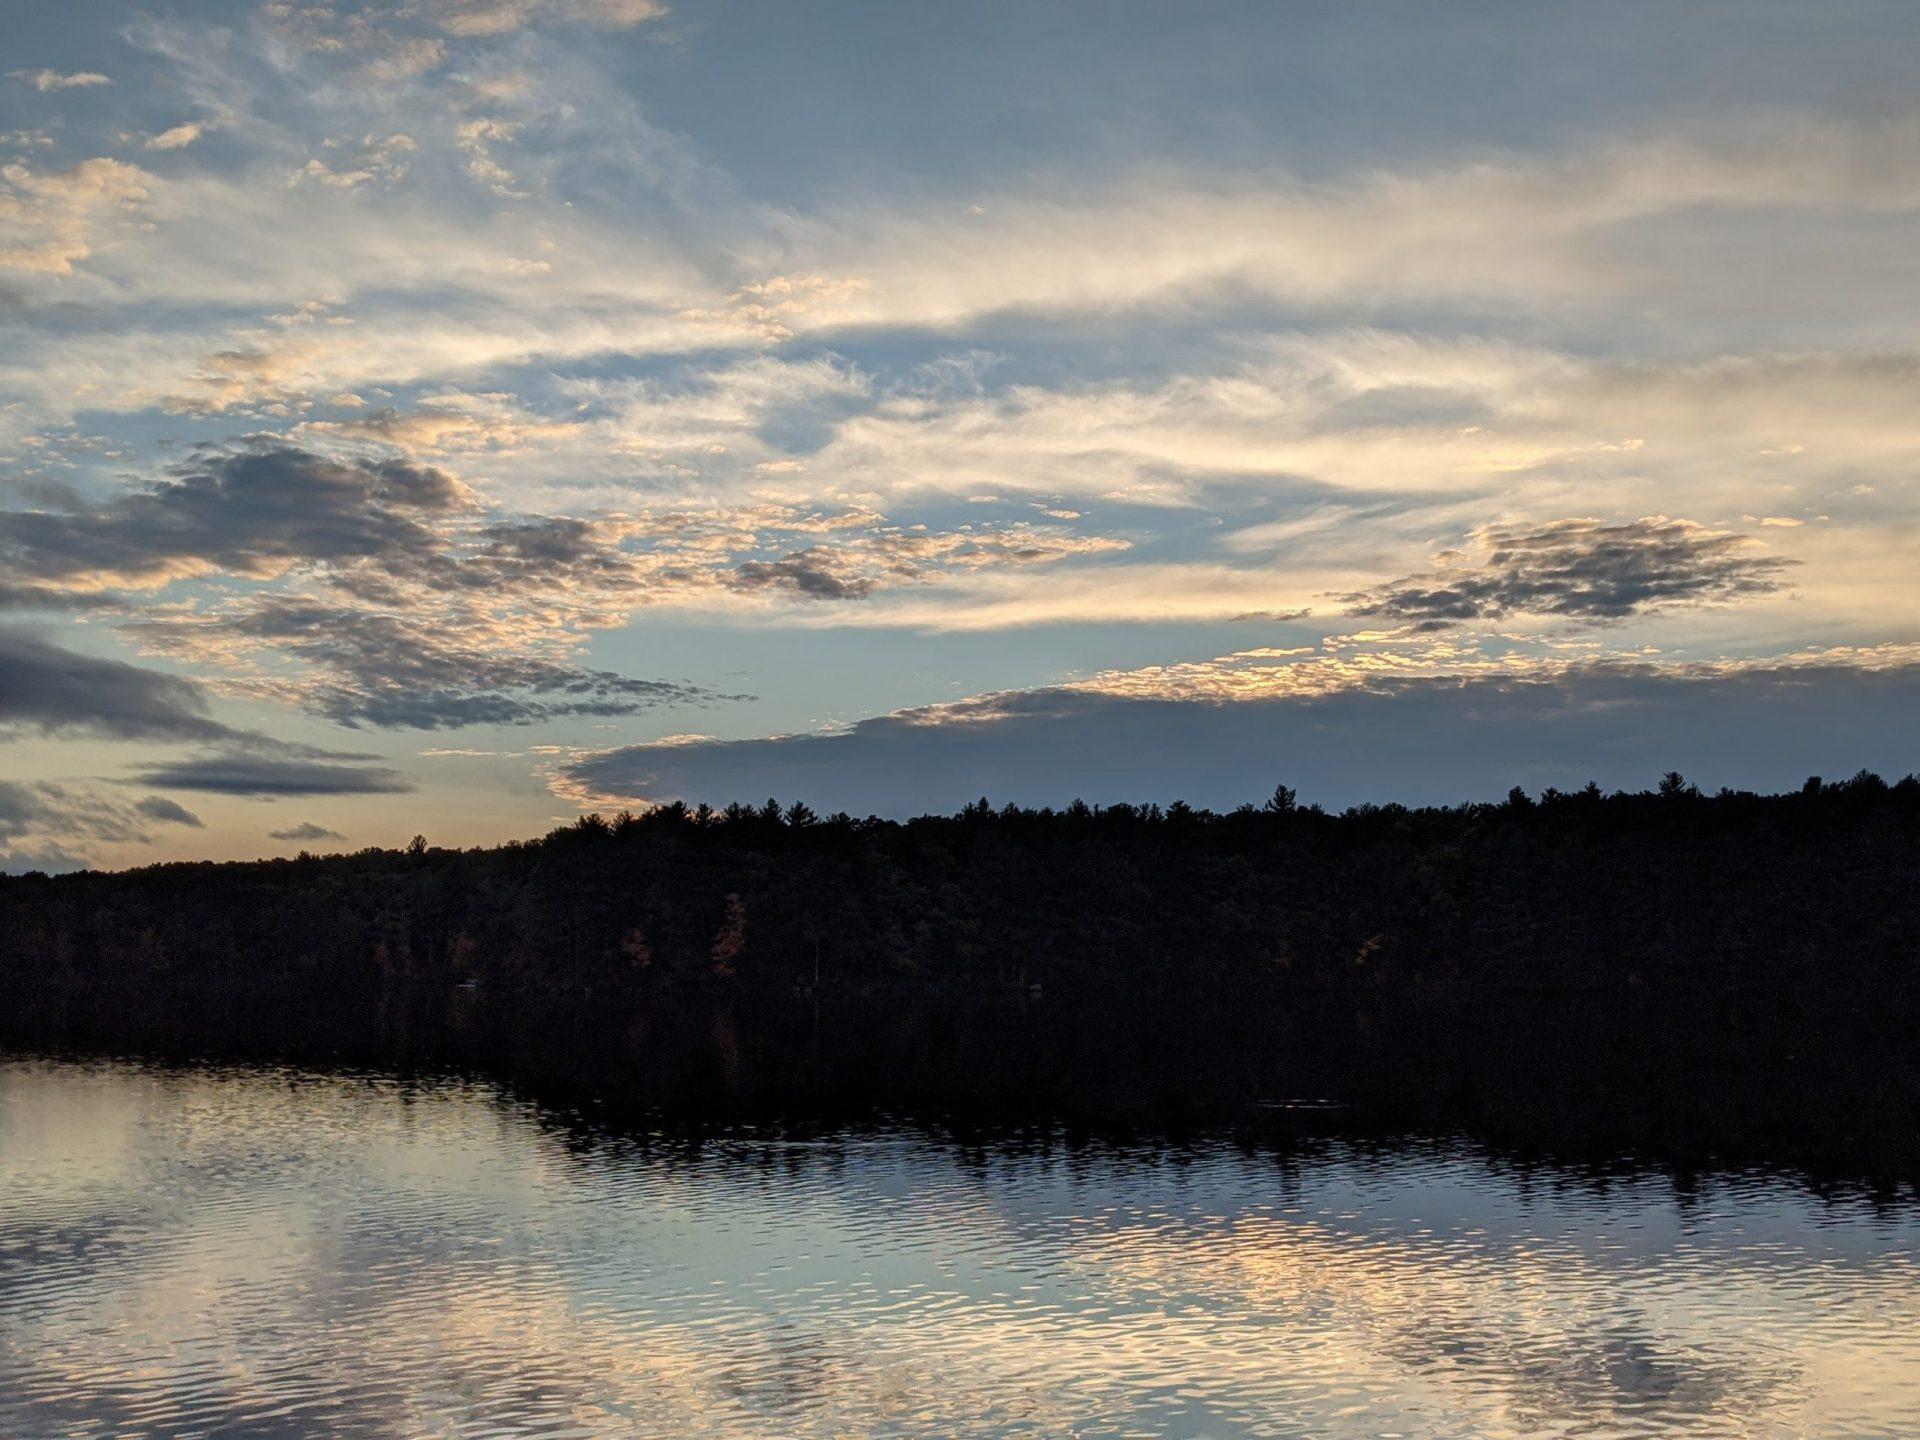 Fall sunset reflected in Ashland Reservoir